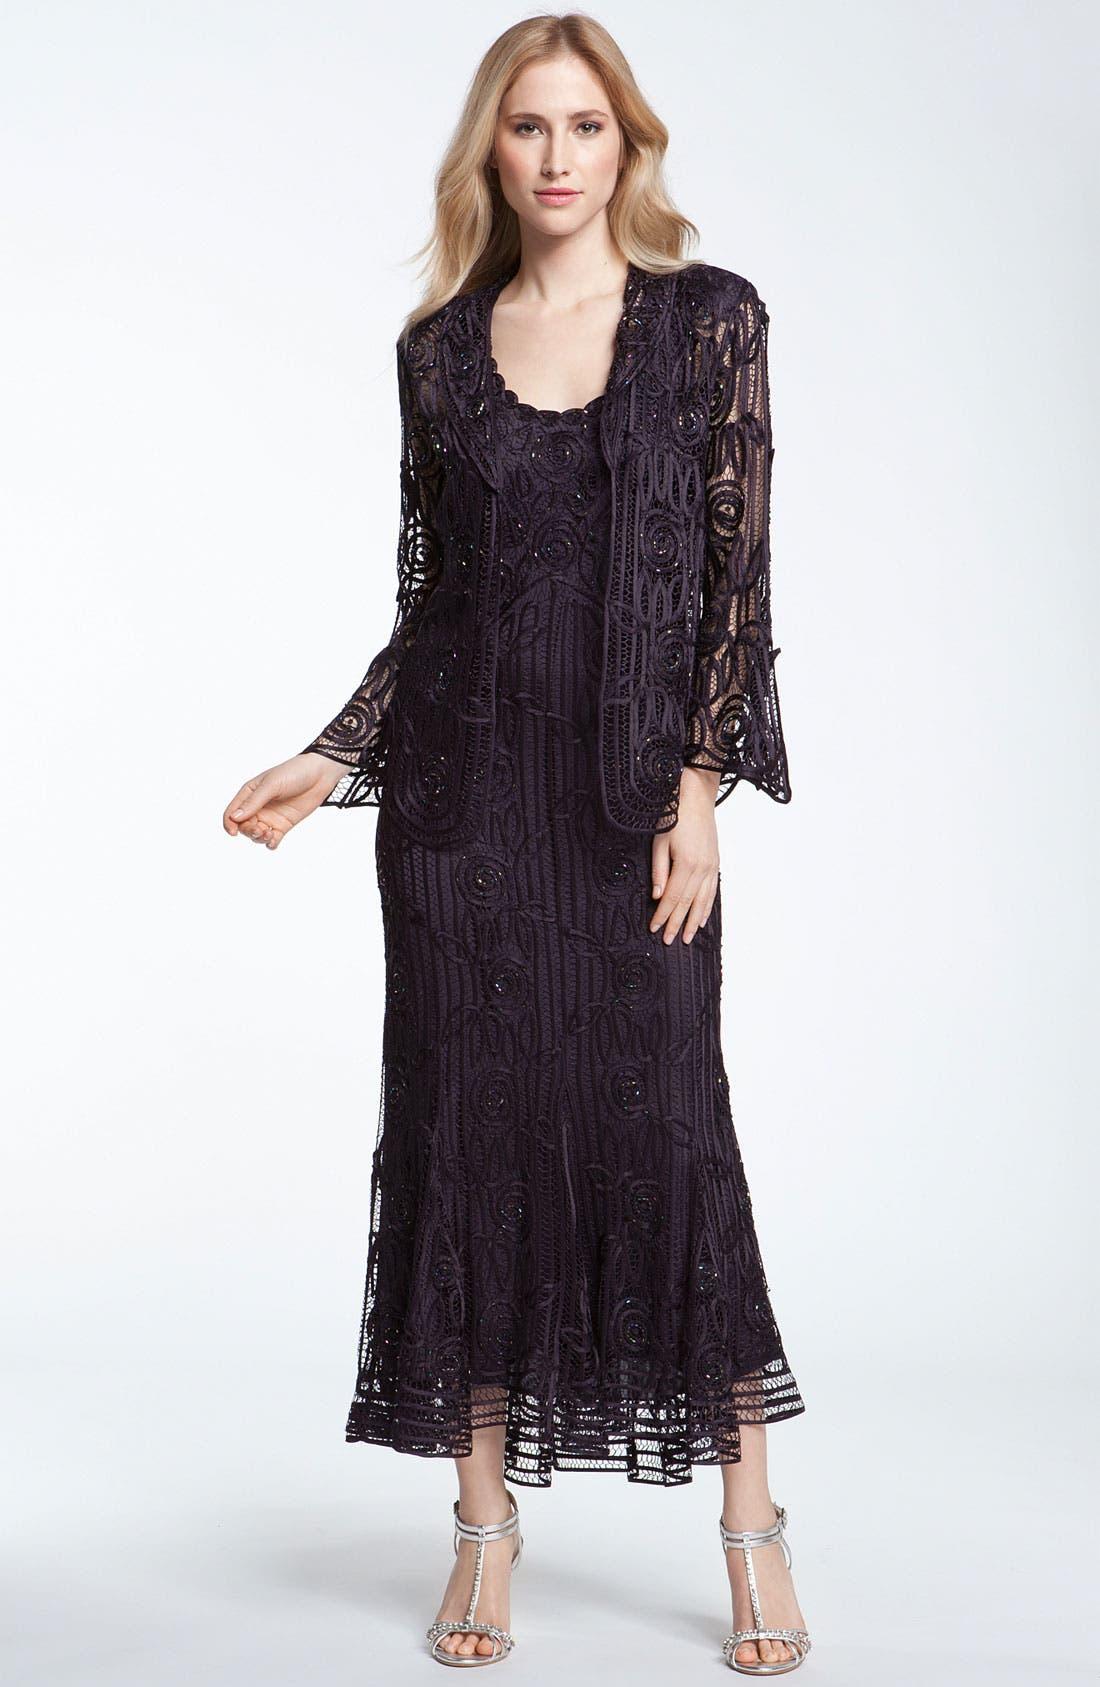 Alternate Image 1 Selected - Soulmates Bead Crochet Dress & Jacket